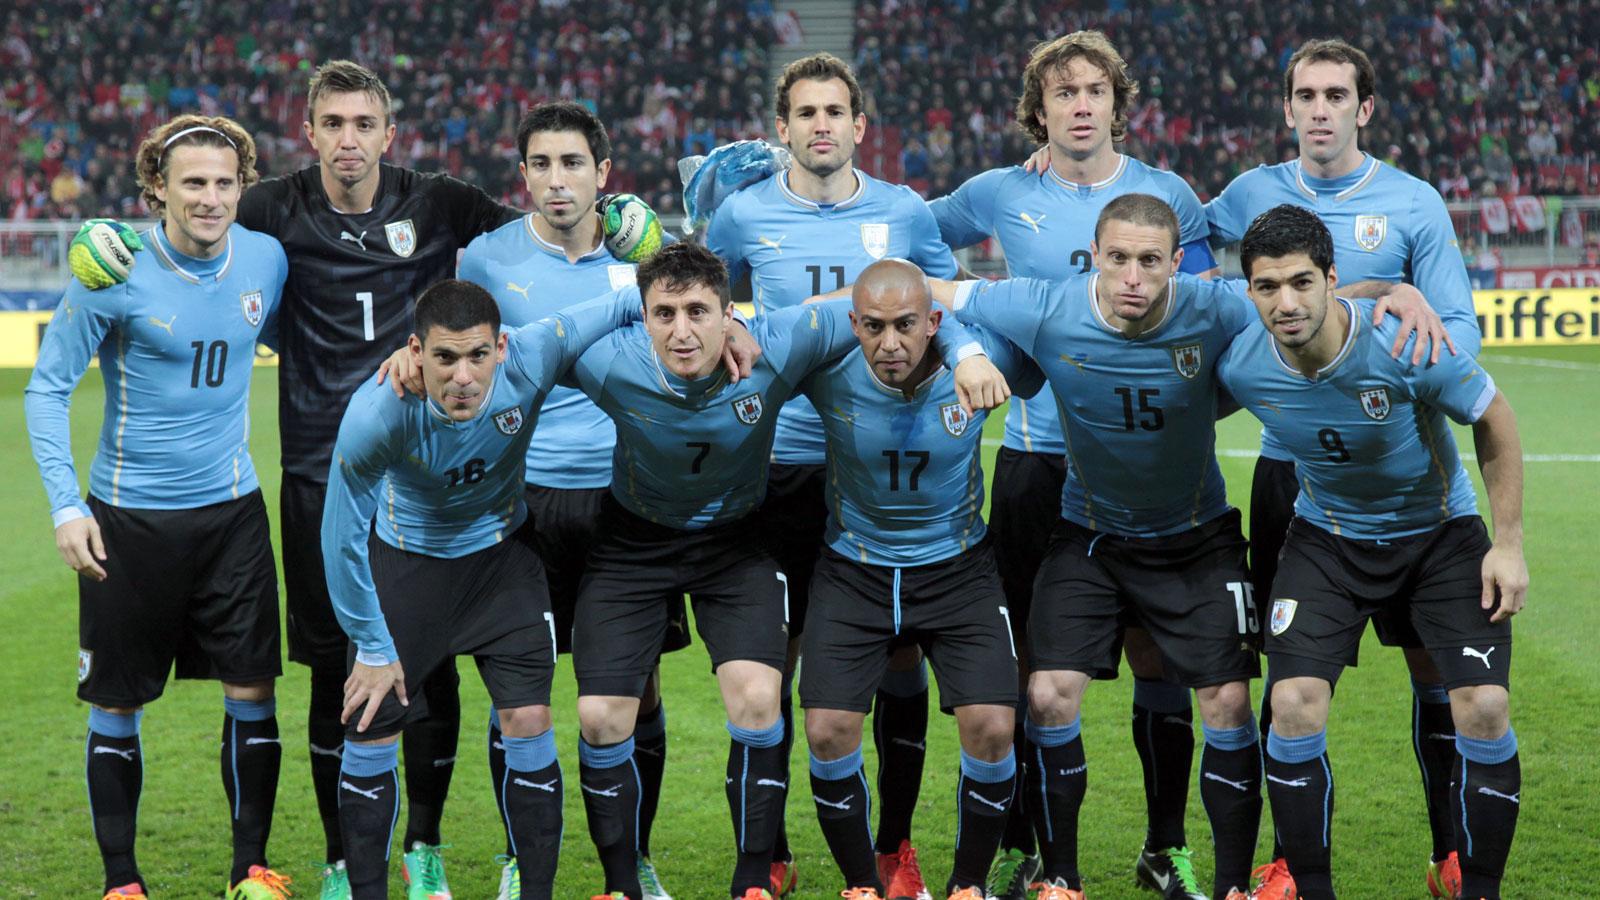 Uruguay - Paraguay (LIVE STREAM) - Soccer Picks & FREE ...